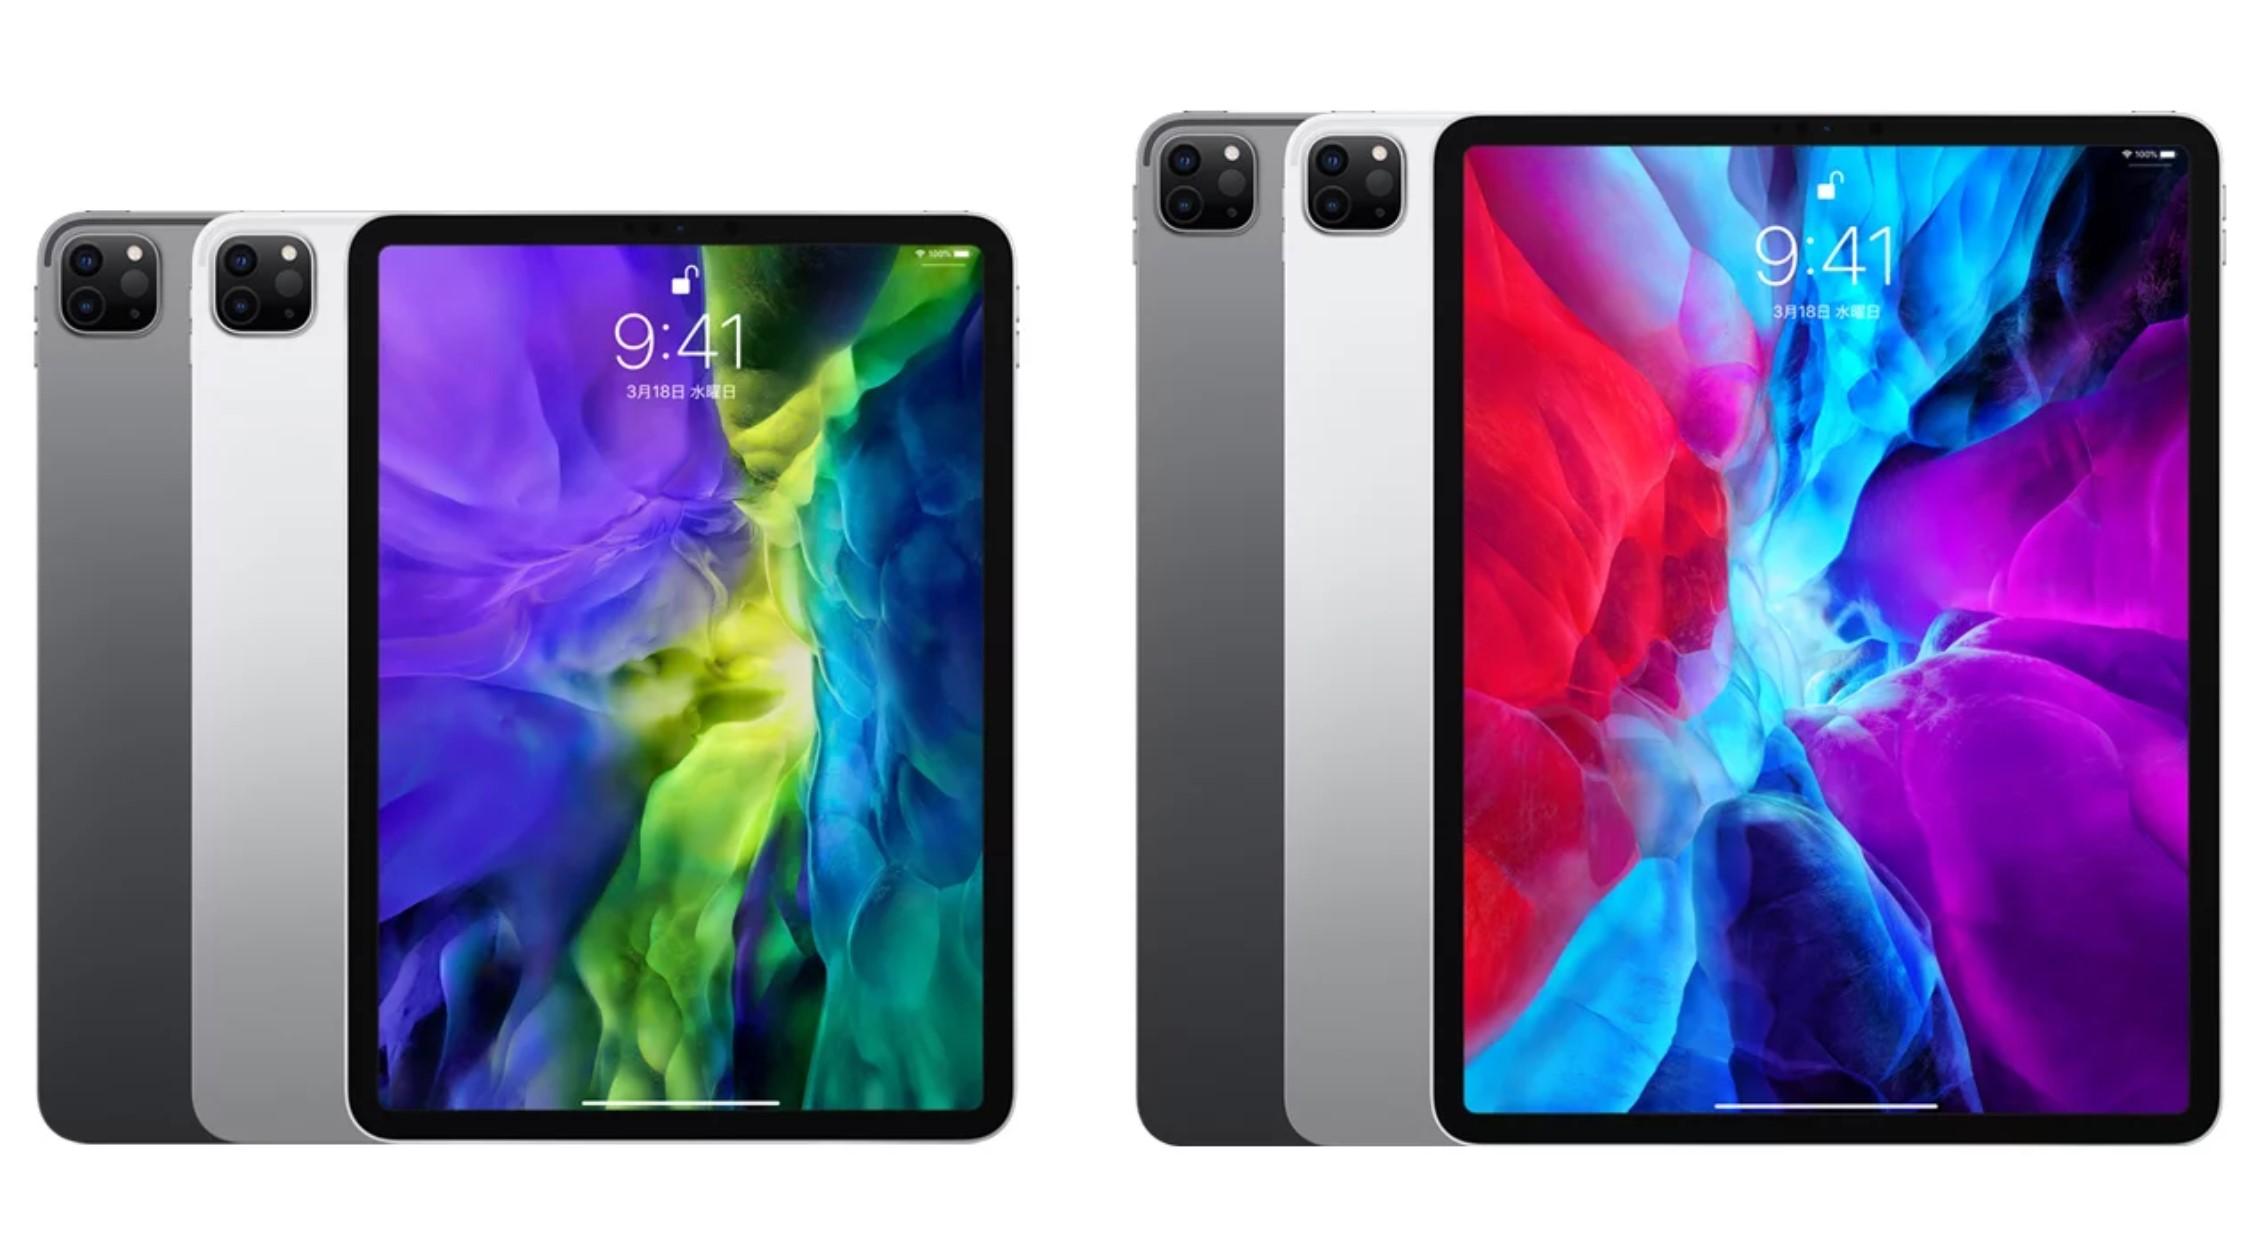 iPad Pro 2020はSIMフリー・ドコモ・au・ソフトバンク版のどのモデルを買うべきか?(楽天モバイル・5Gの対応状況も)